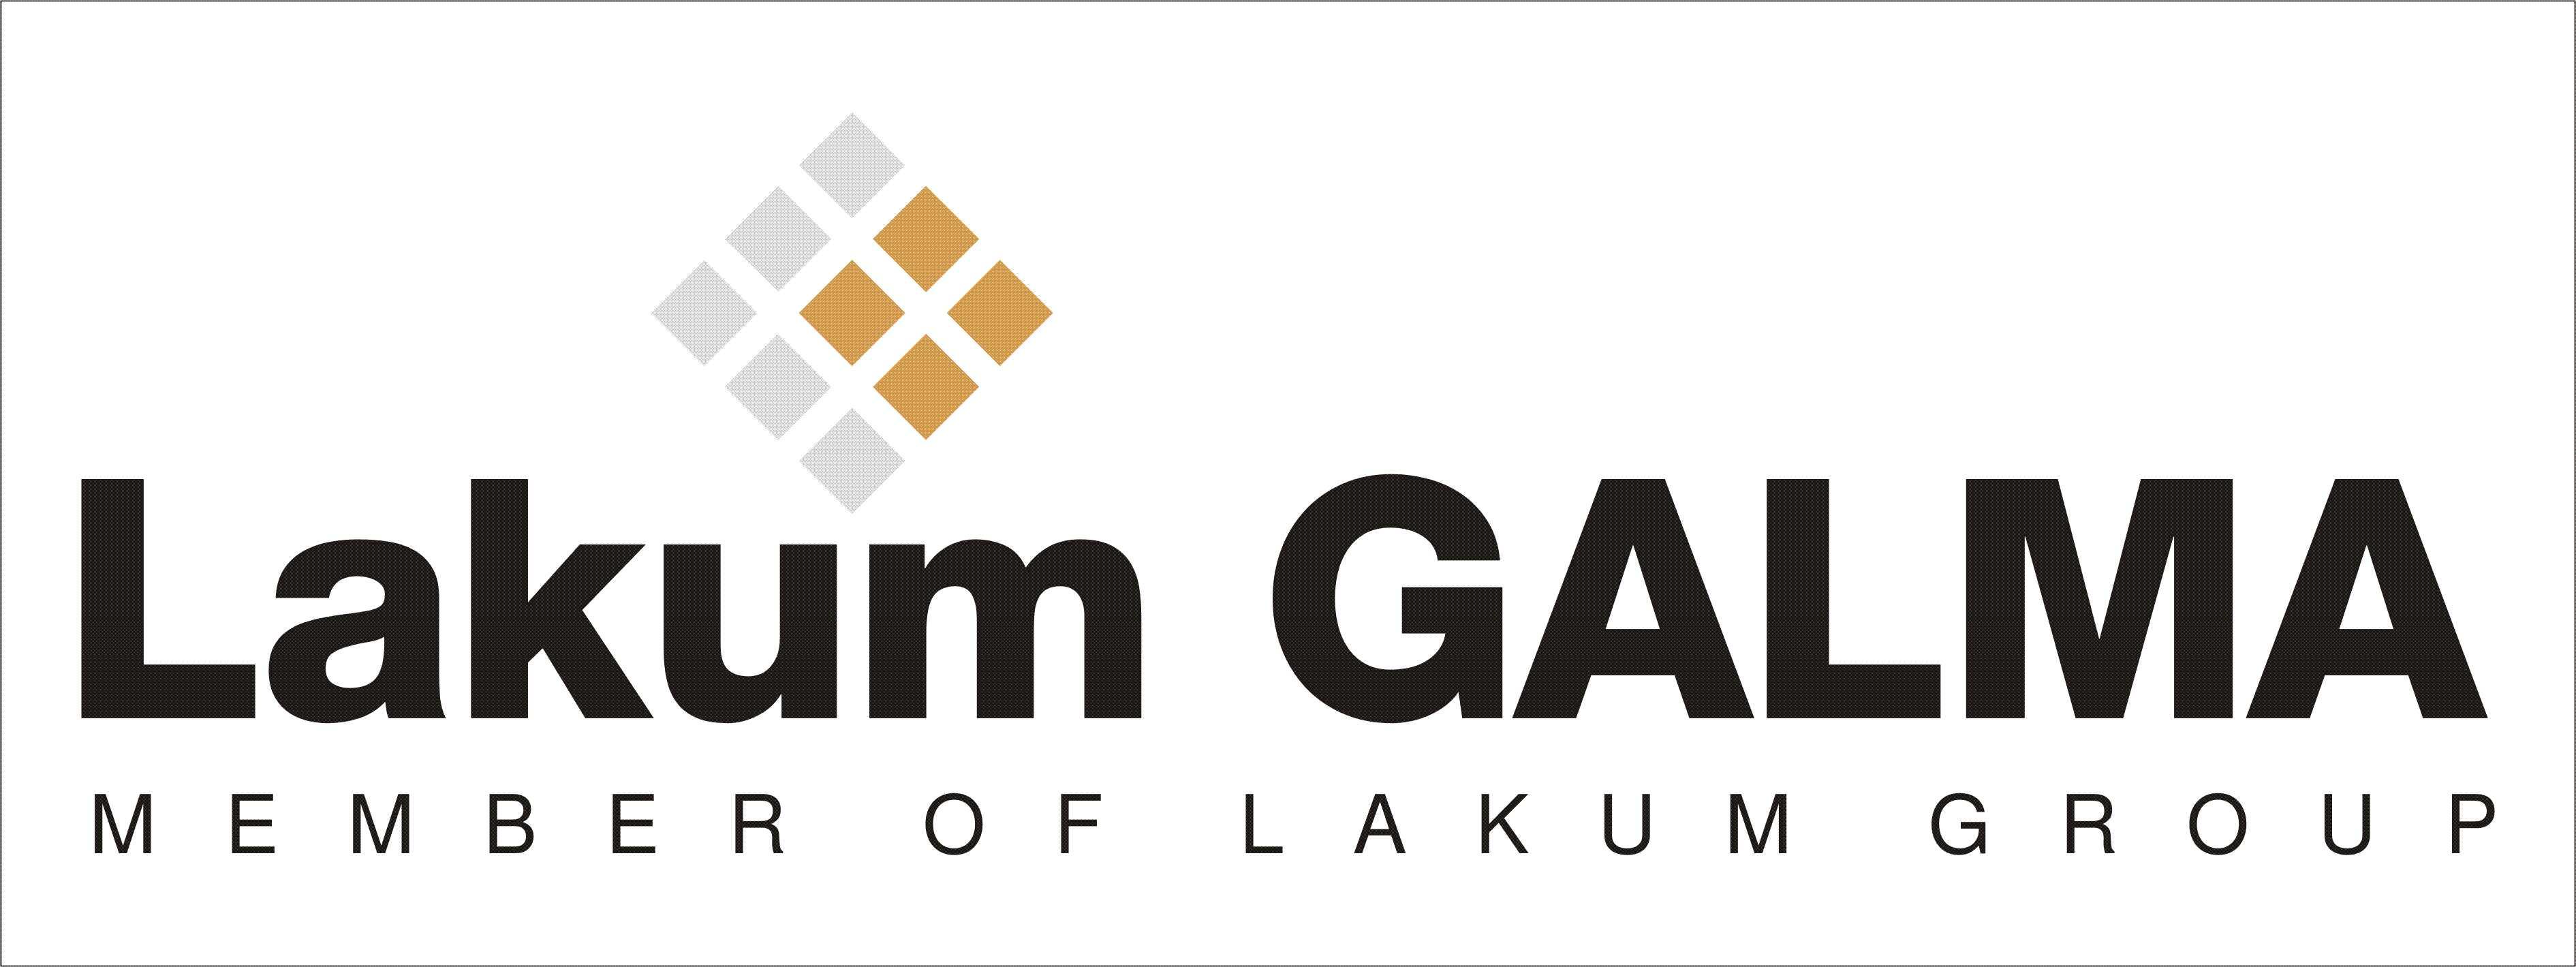 lakum-galma